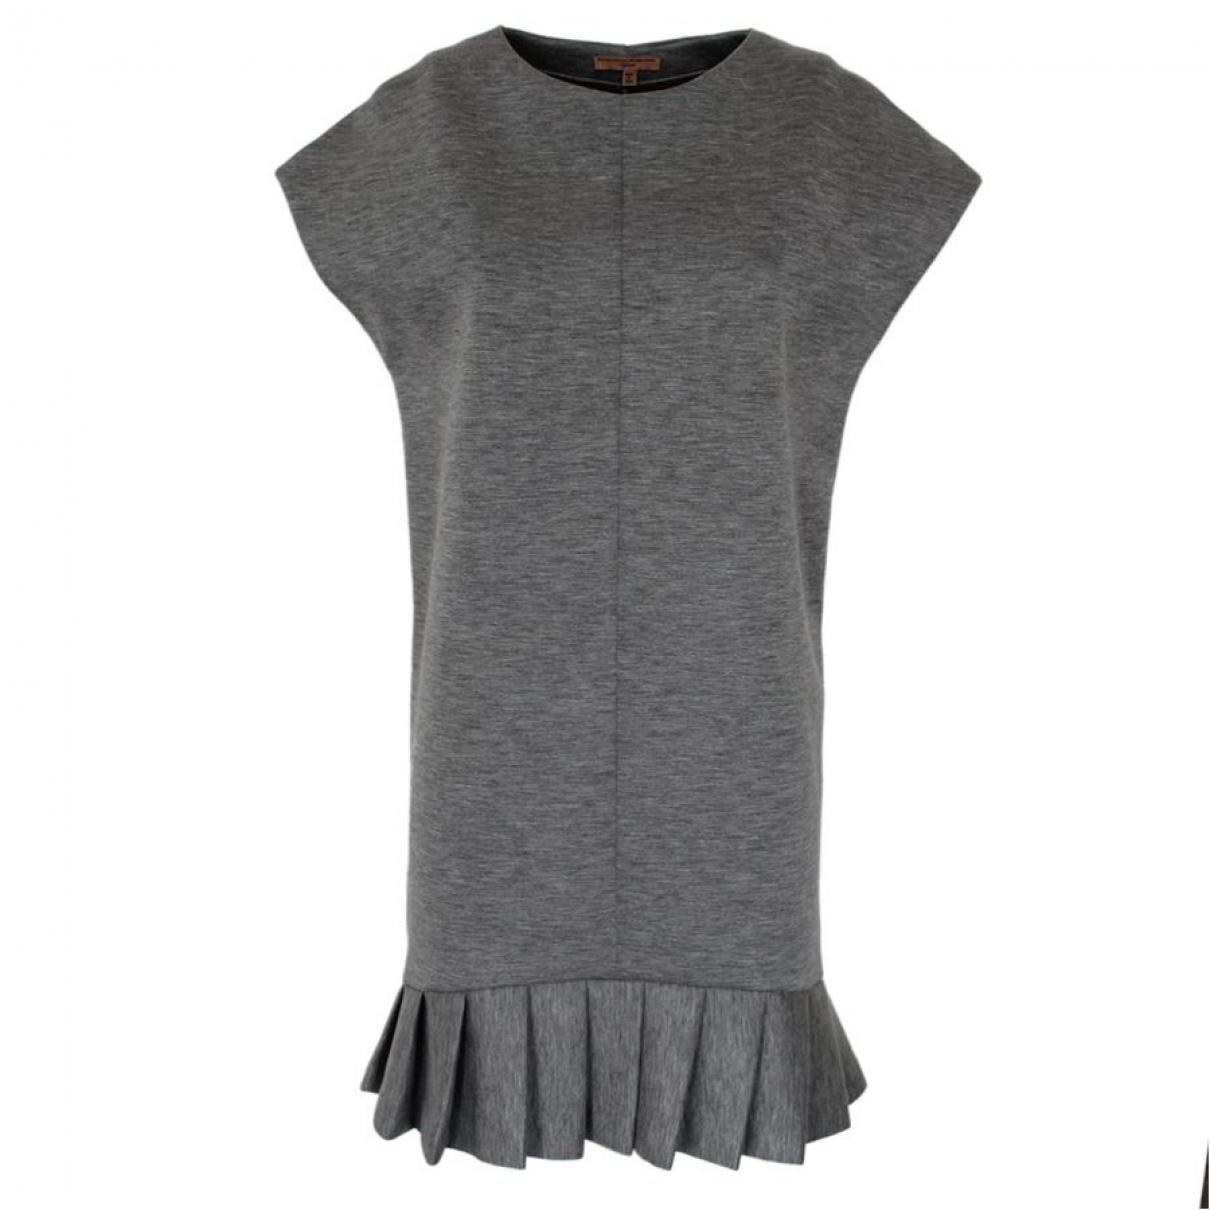 Ermanno Scervino \N Grey Cotton dress for Women 40 IT